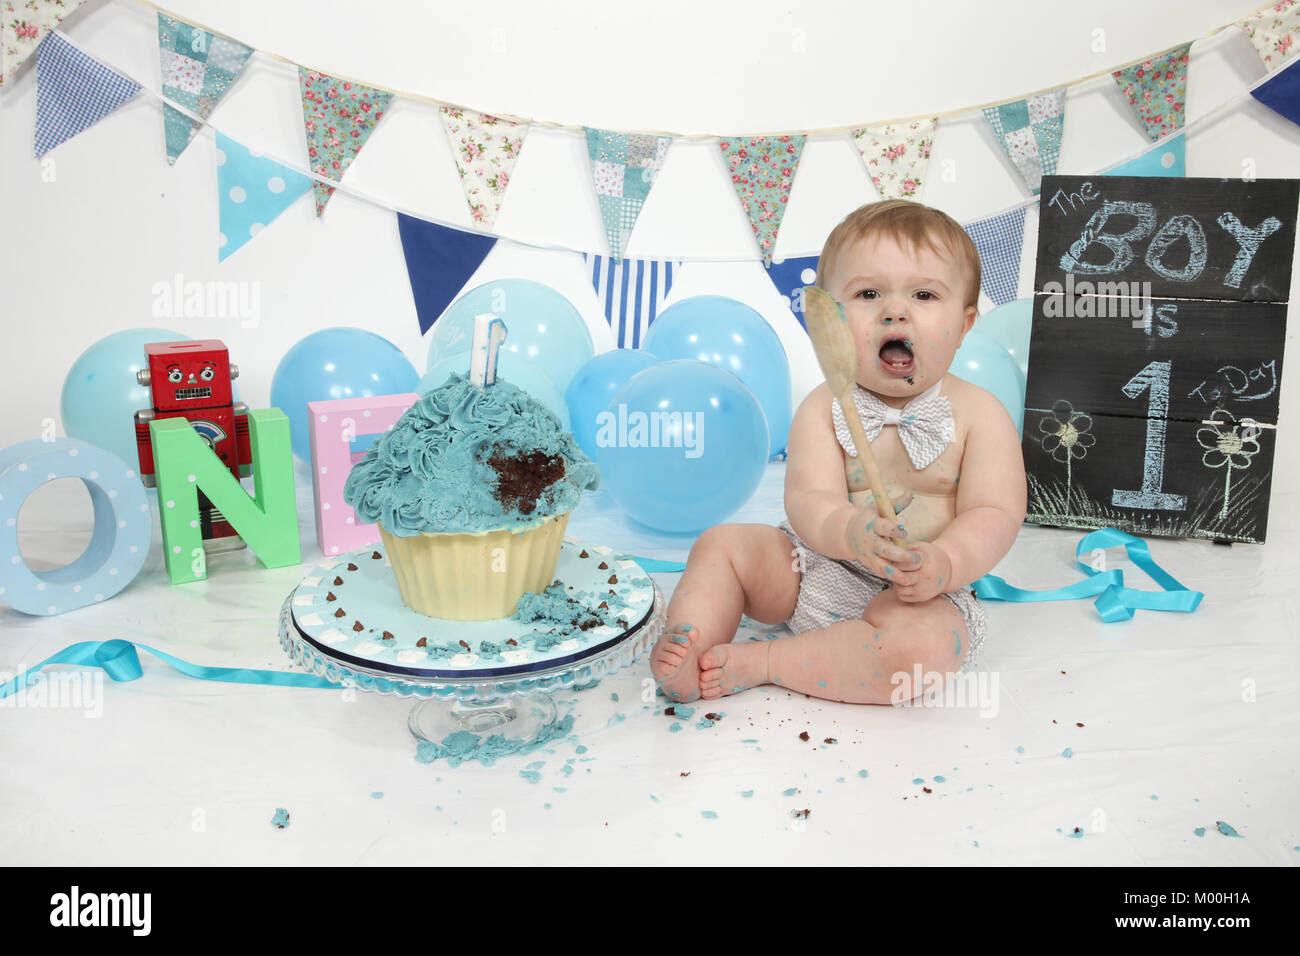 1 Year Old Boy Birthday Party Cake Smash Fun Food Stock Photo